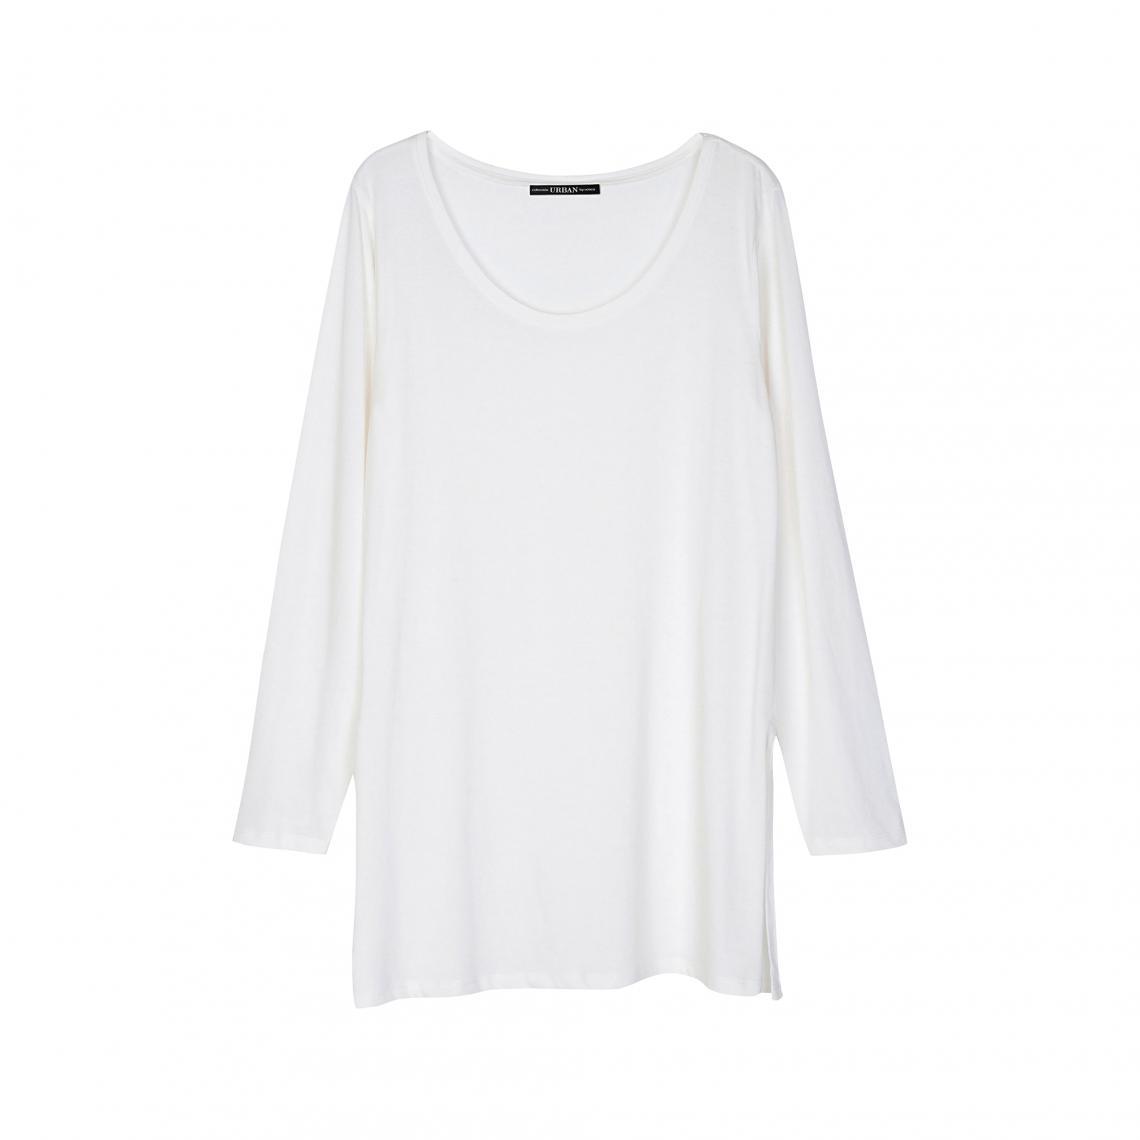 fcb0dcbffa454 Tee-shirt long fendu manches longues col rond femme - Blanc | 3 SUISSES